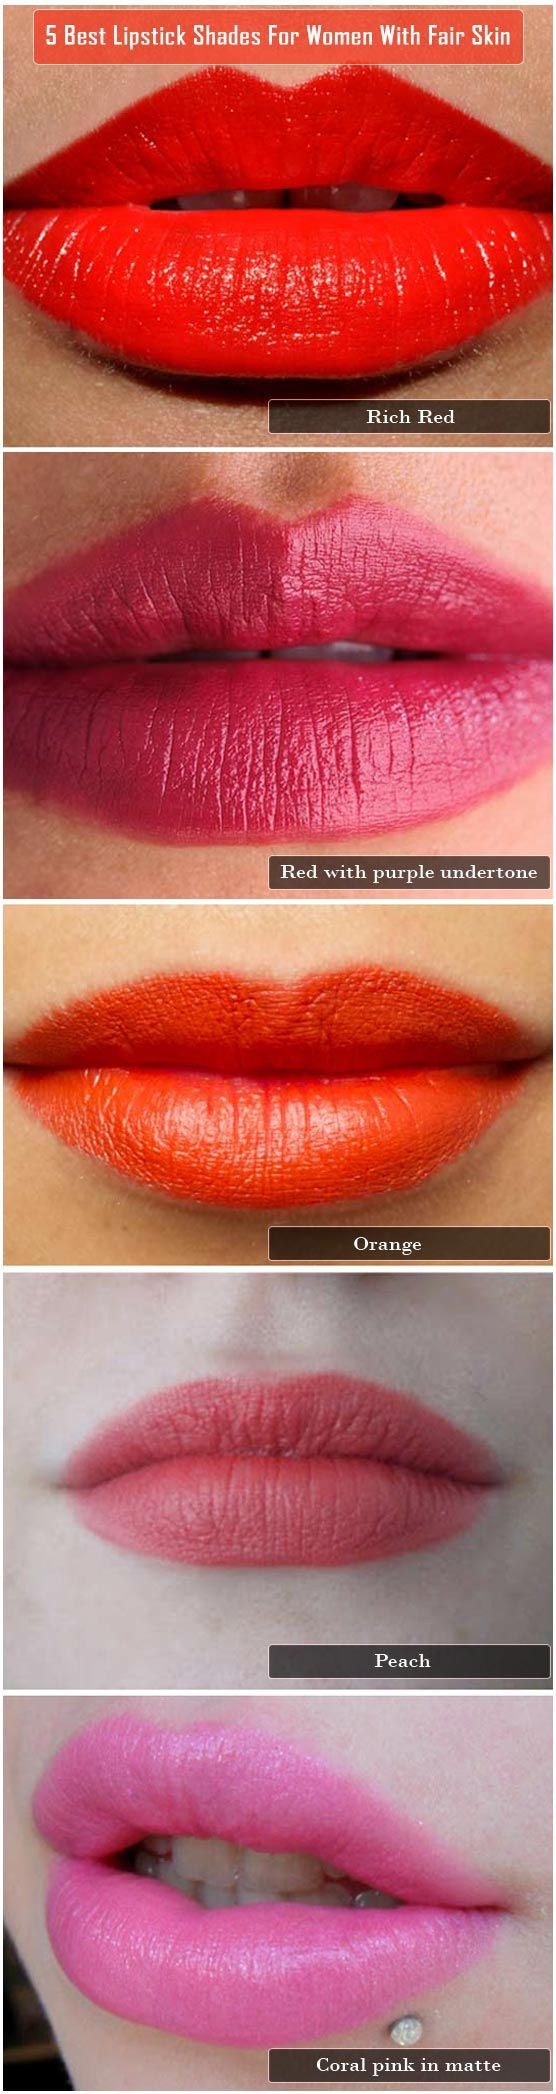 5 Best Lipstick Shades For Women With Fair Skin